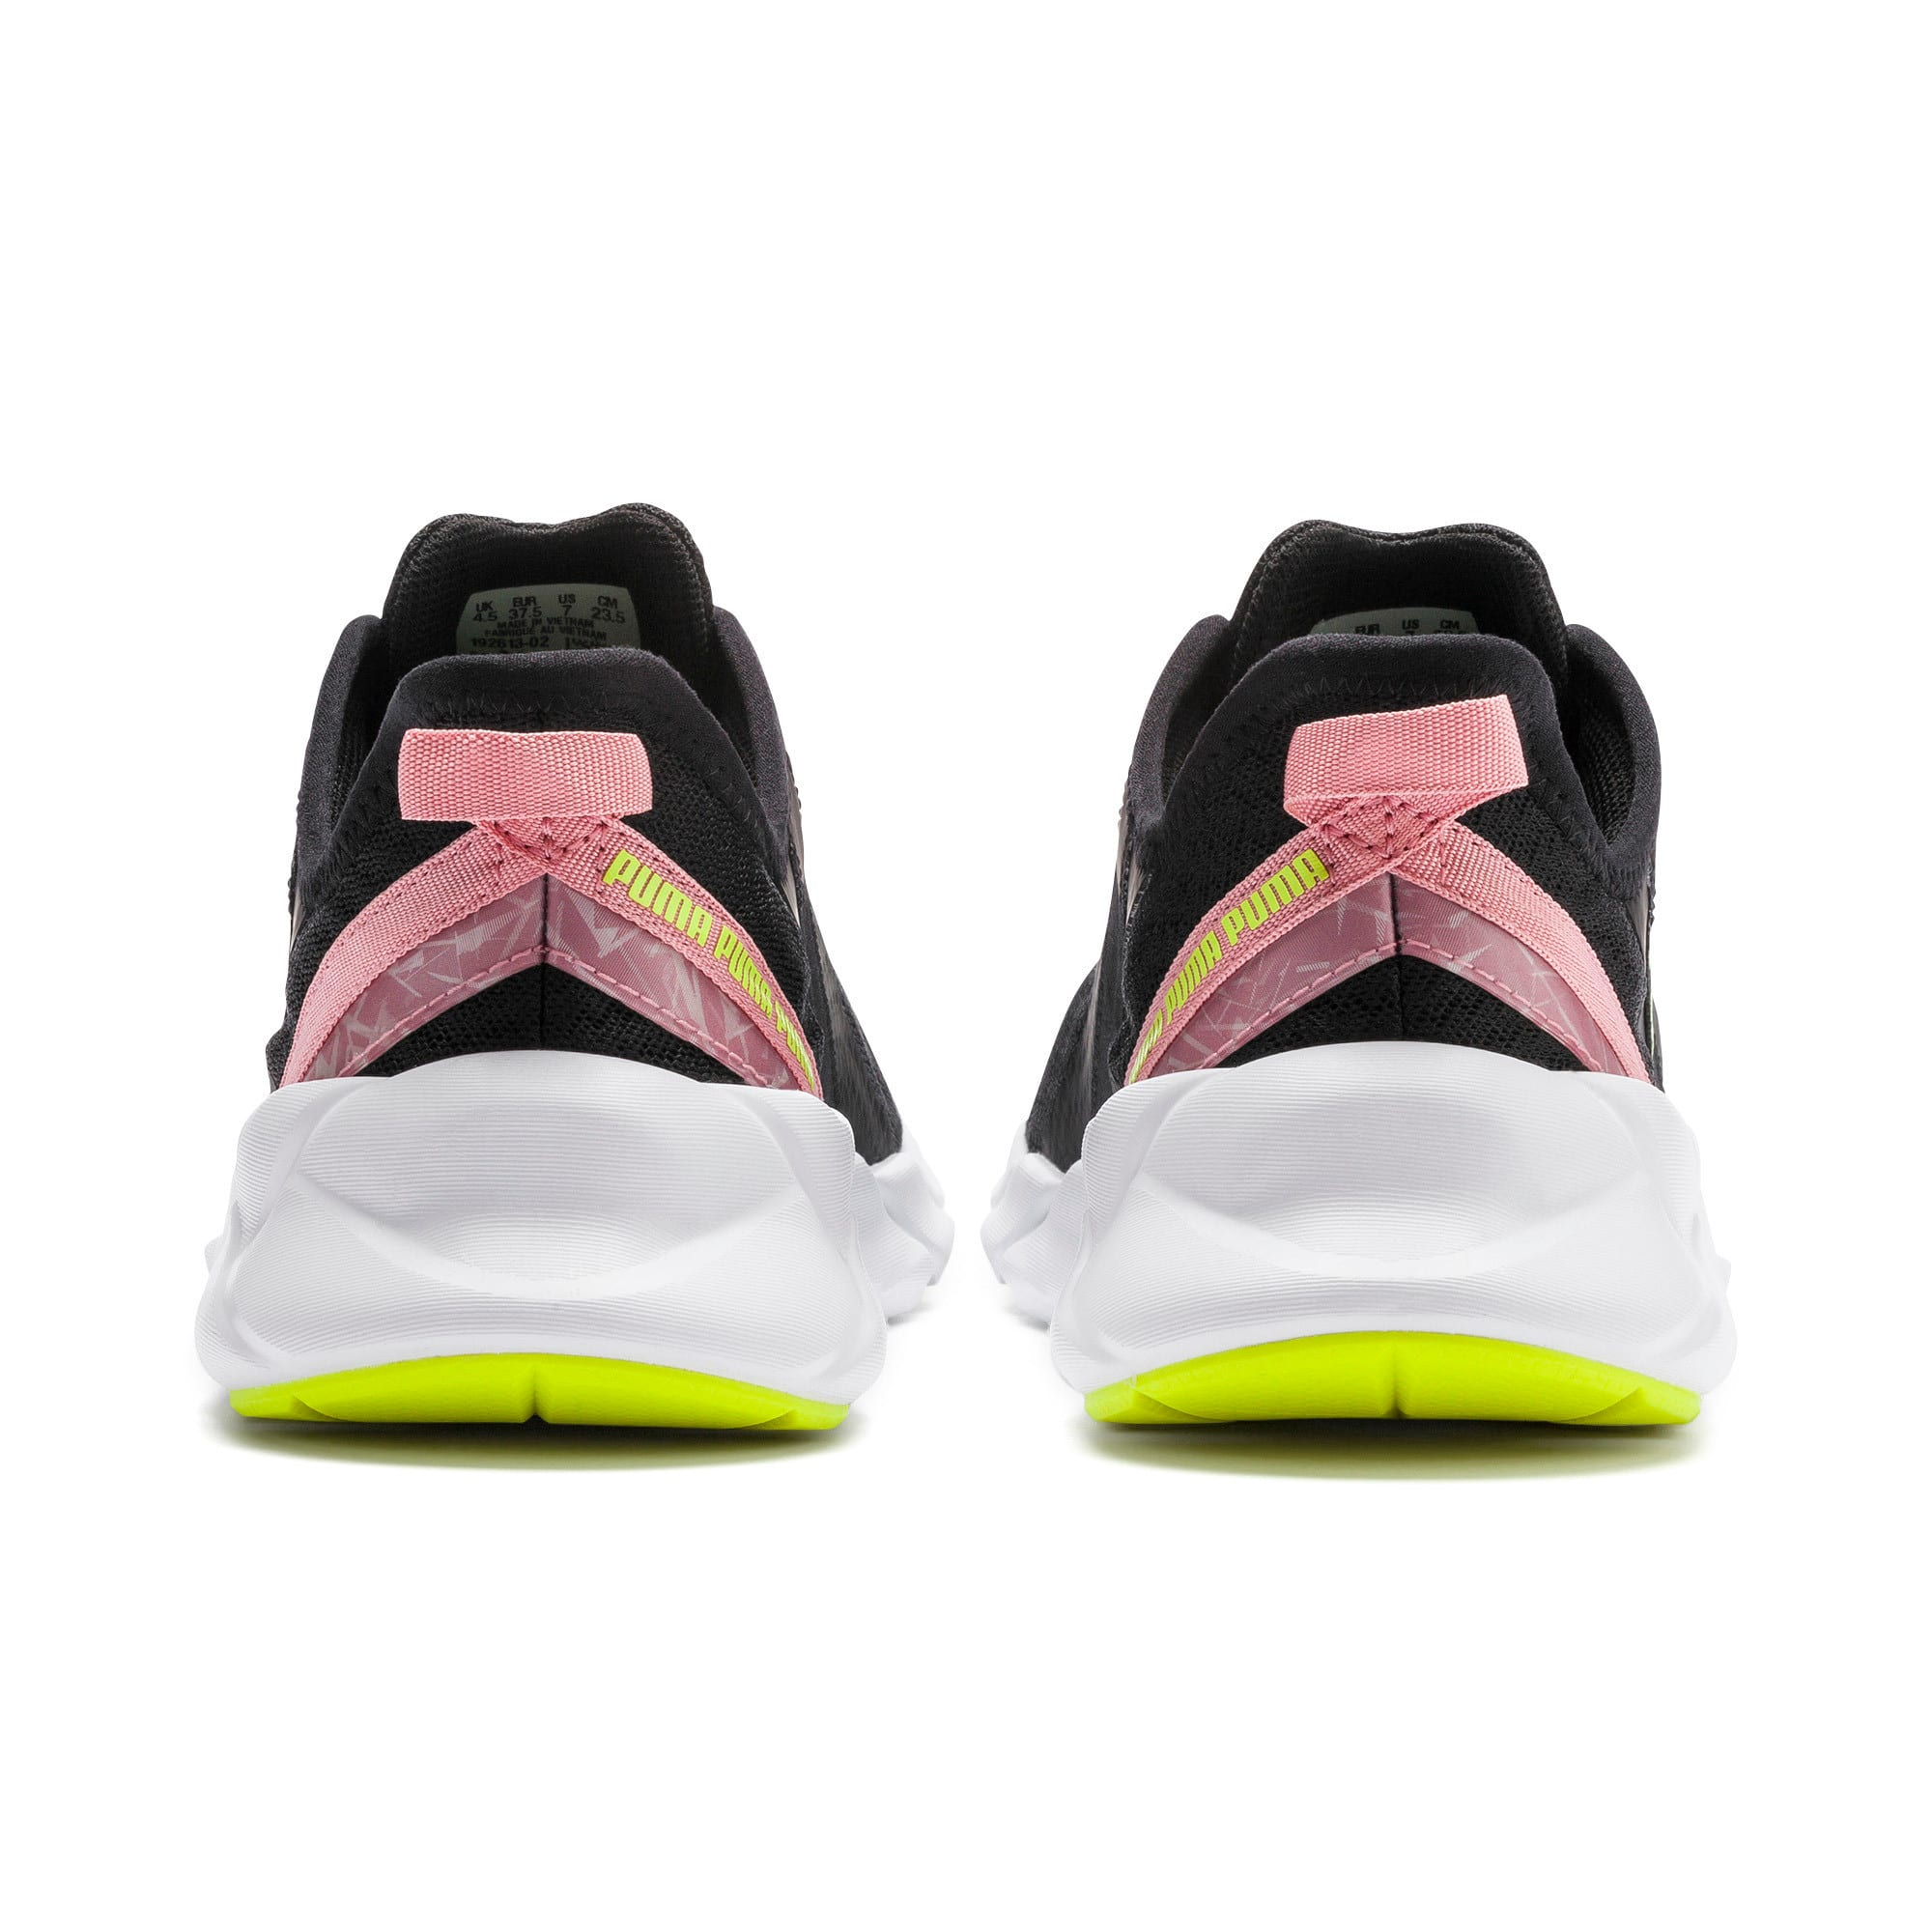 Thumbnail 4 of Weave XT Shift Women's Training Shoes, Puma Black-Puma White, medium